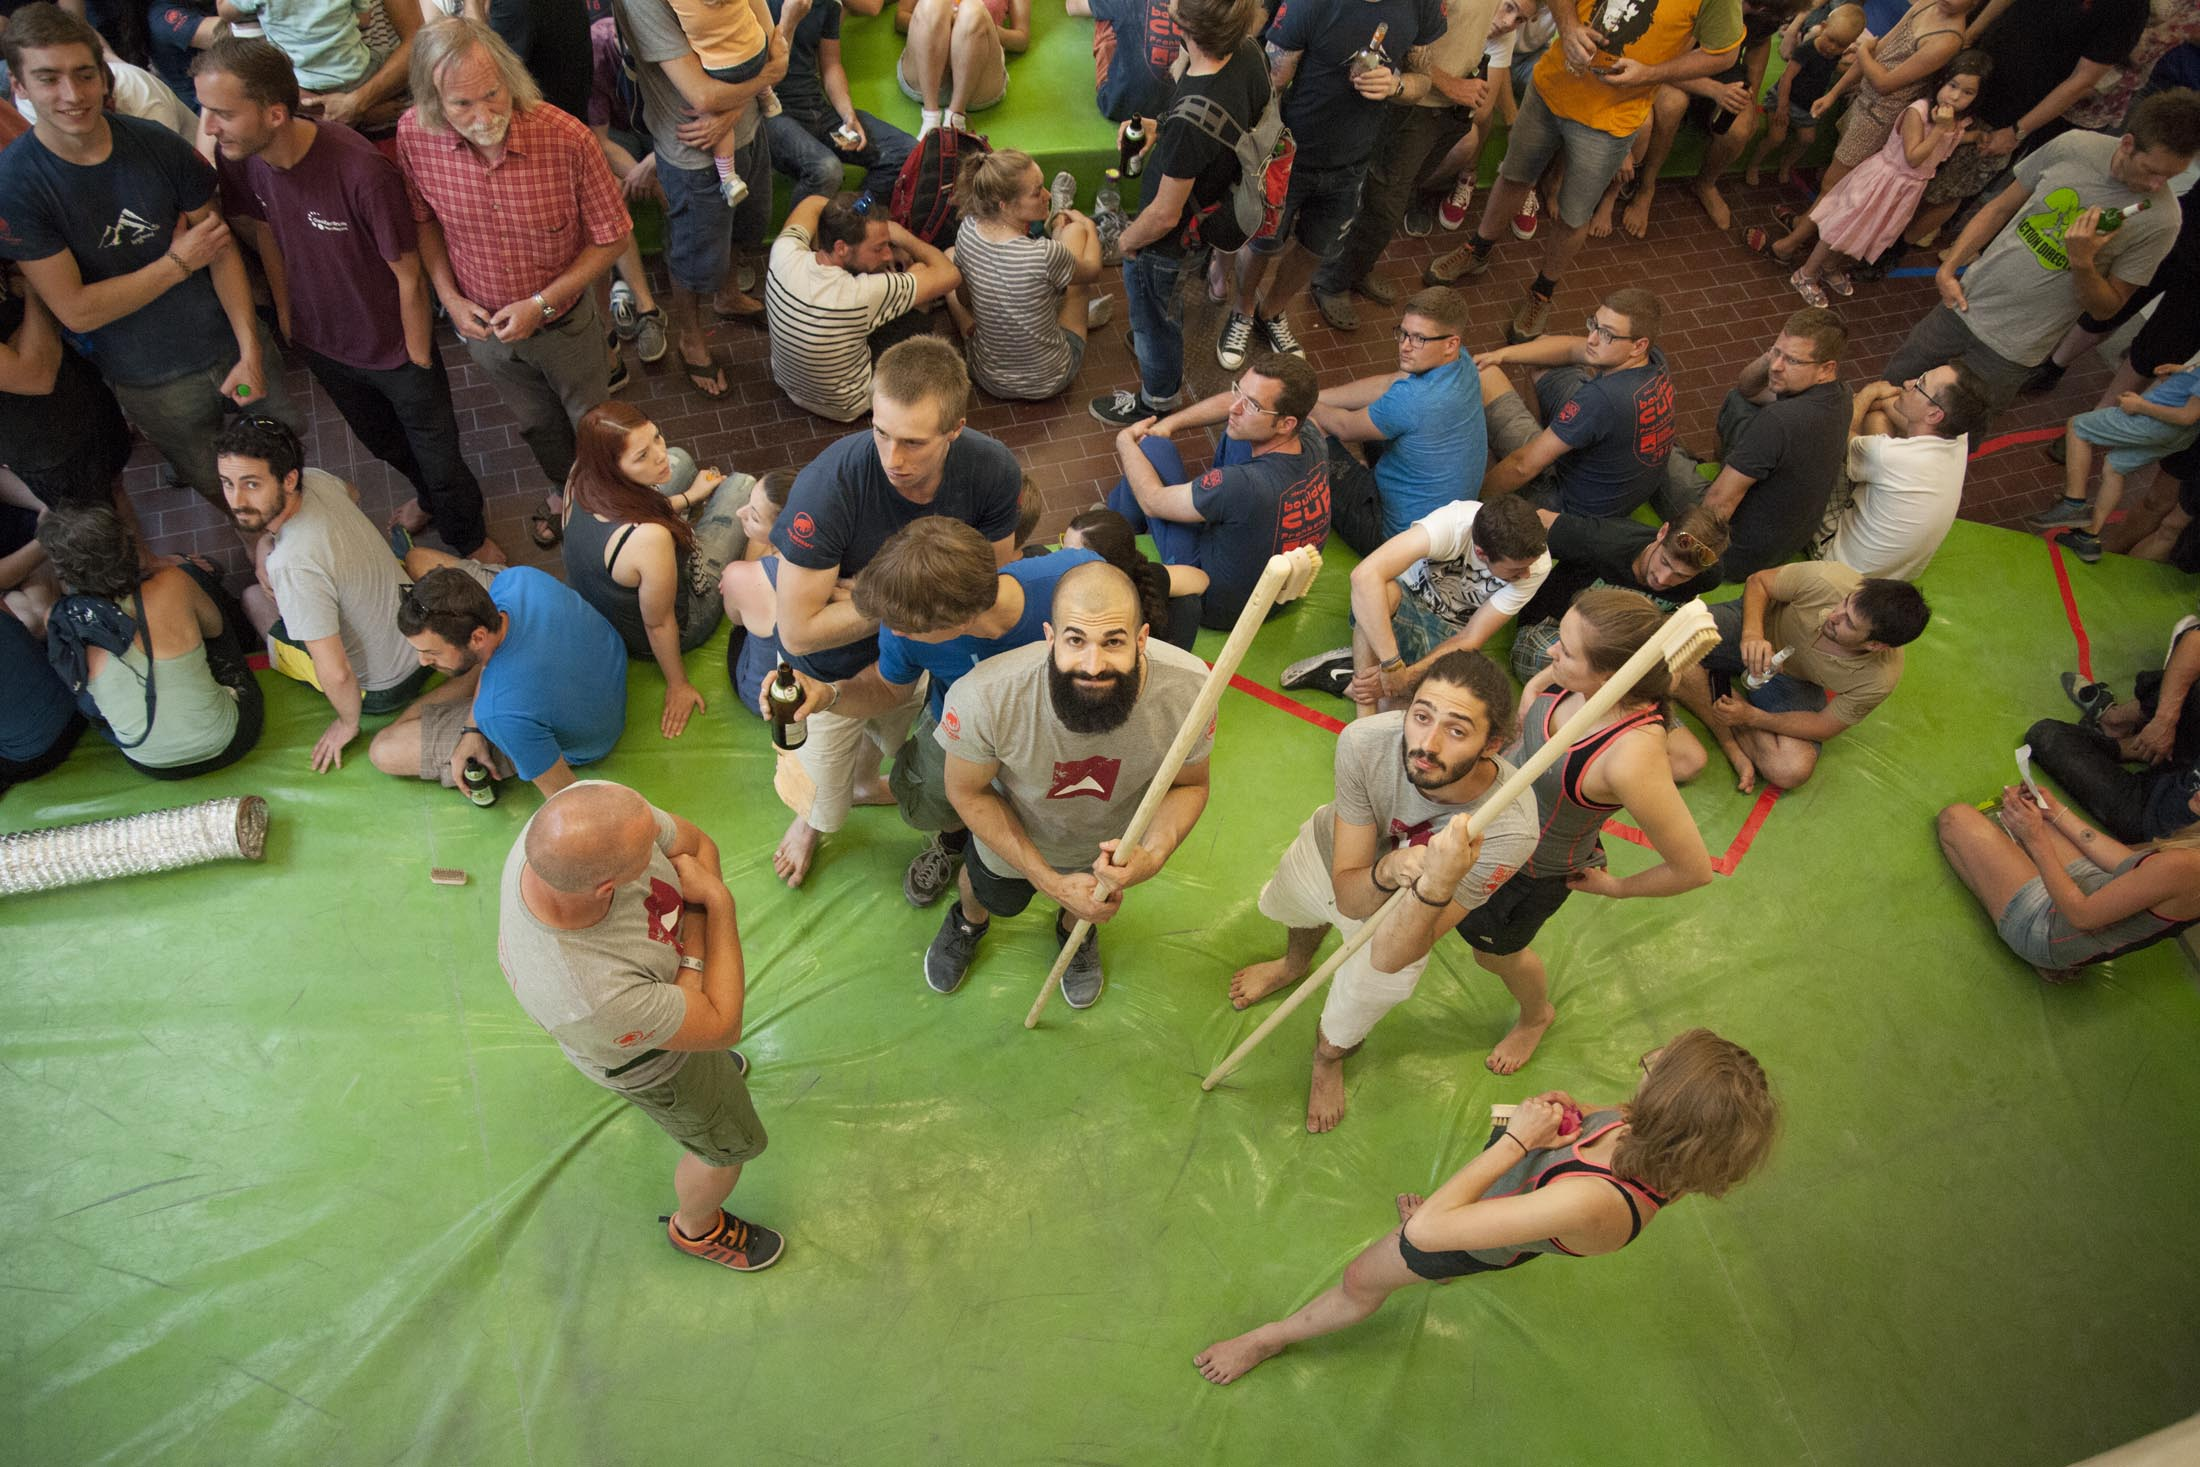 Finale, internationaler bouldercup Frankenjura 2016, BLOCKHELDEN Erlangen, Mammut, Bergfreunde.de, Boulderwettkampf07092016441